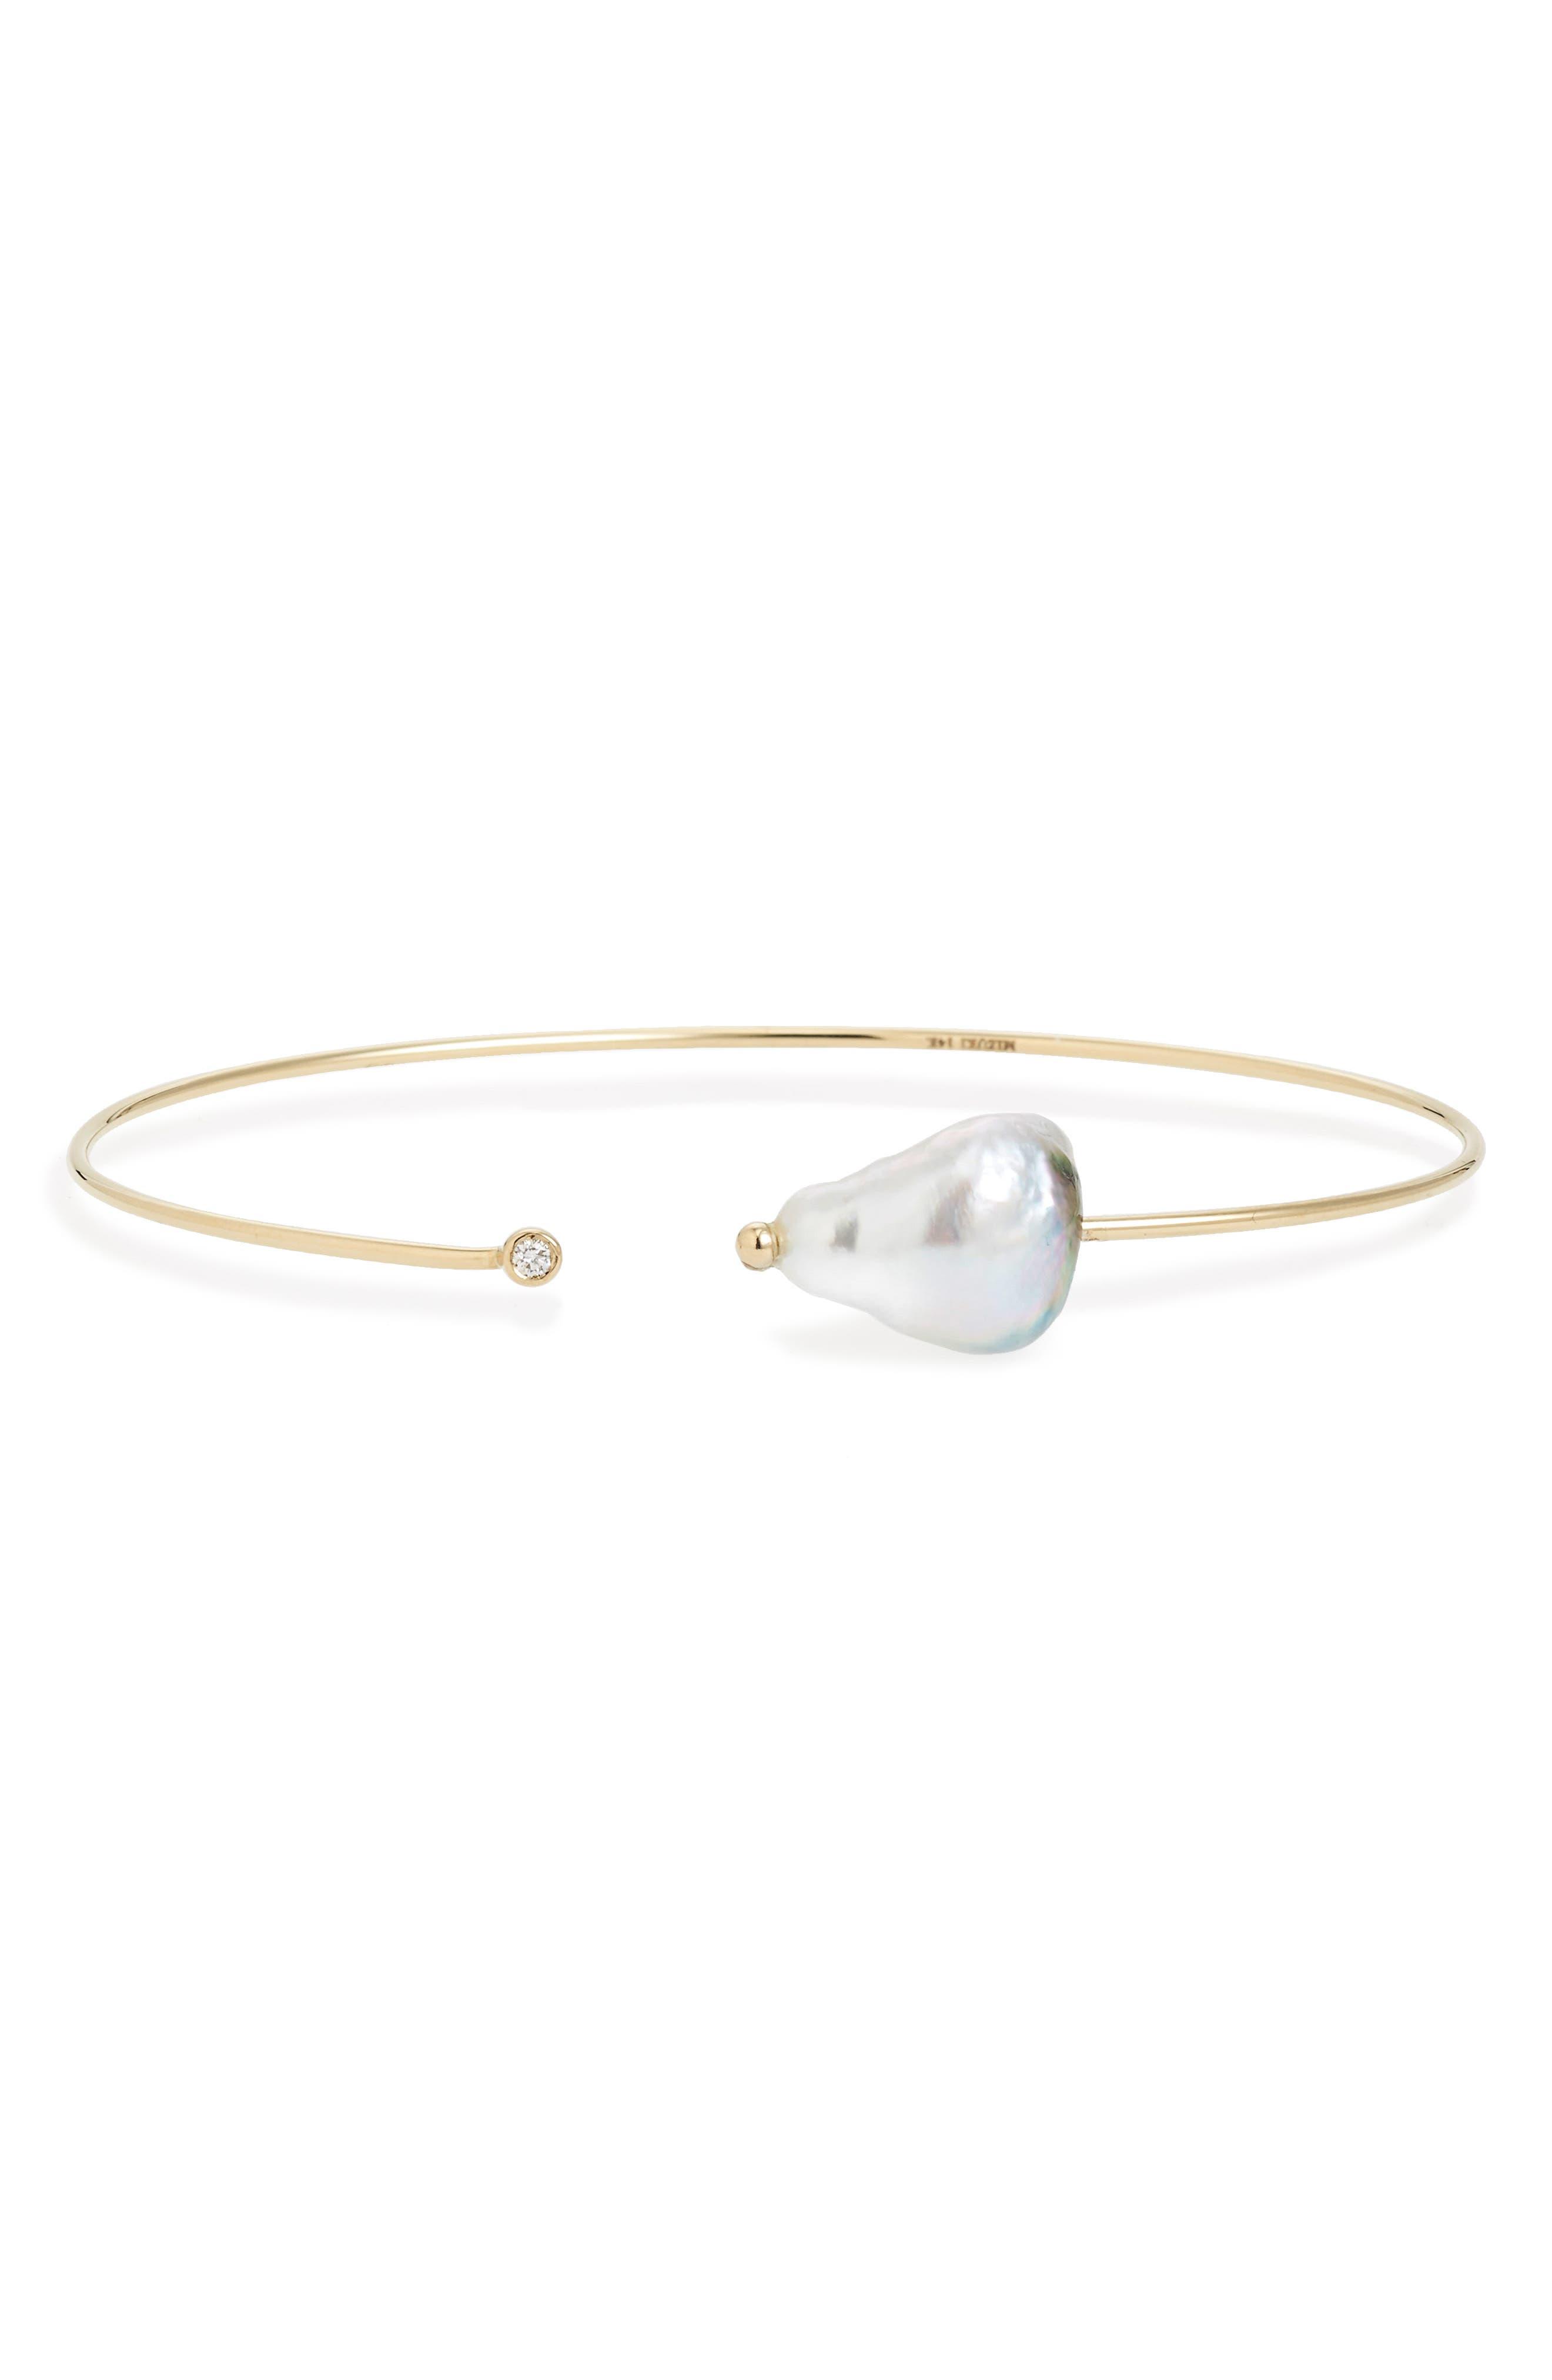 Diamond & Pearl Bracelet,                             Main thumbnail 1, color,                             Yellow Gold/ Grey Pearl